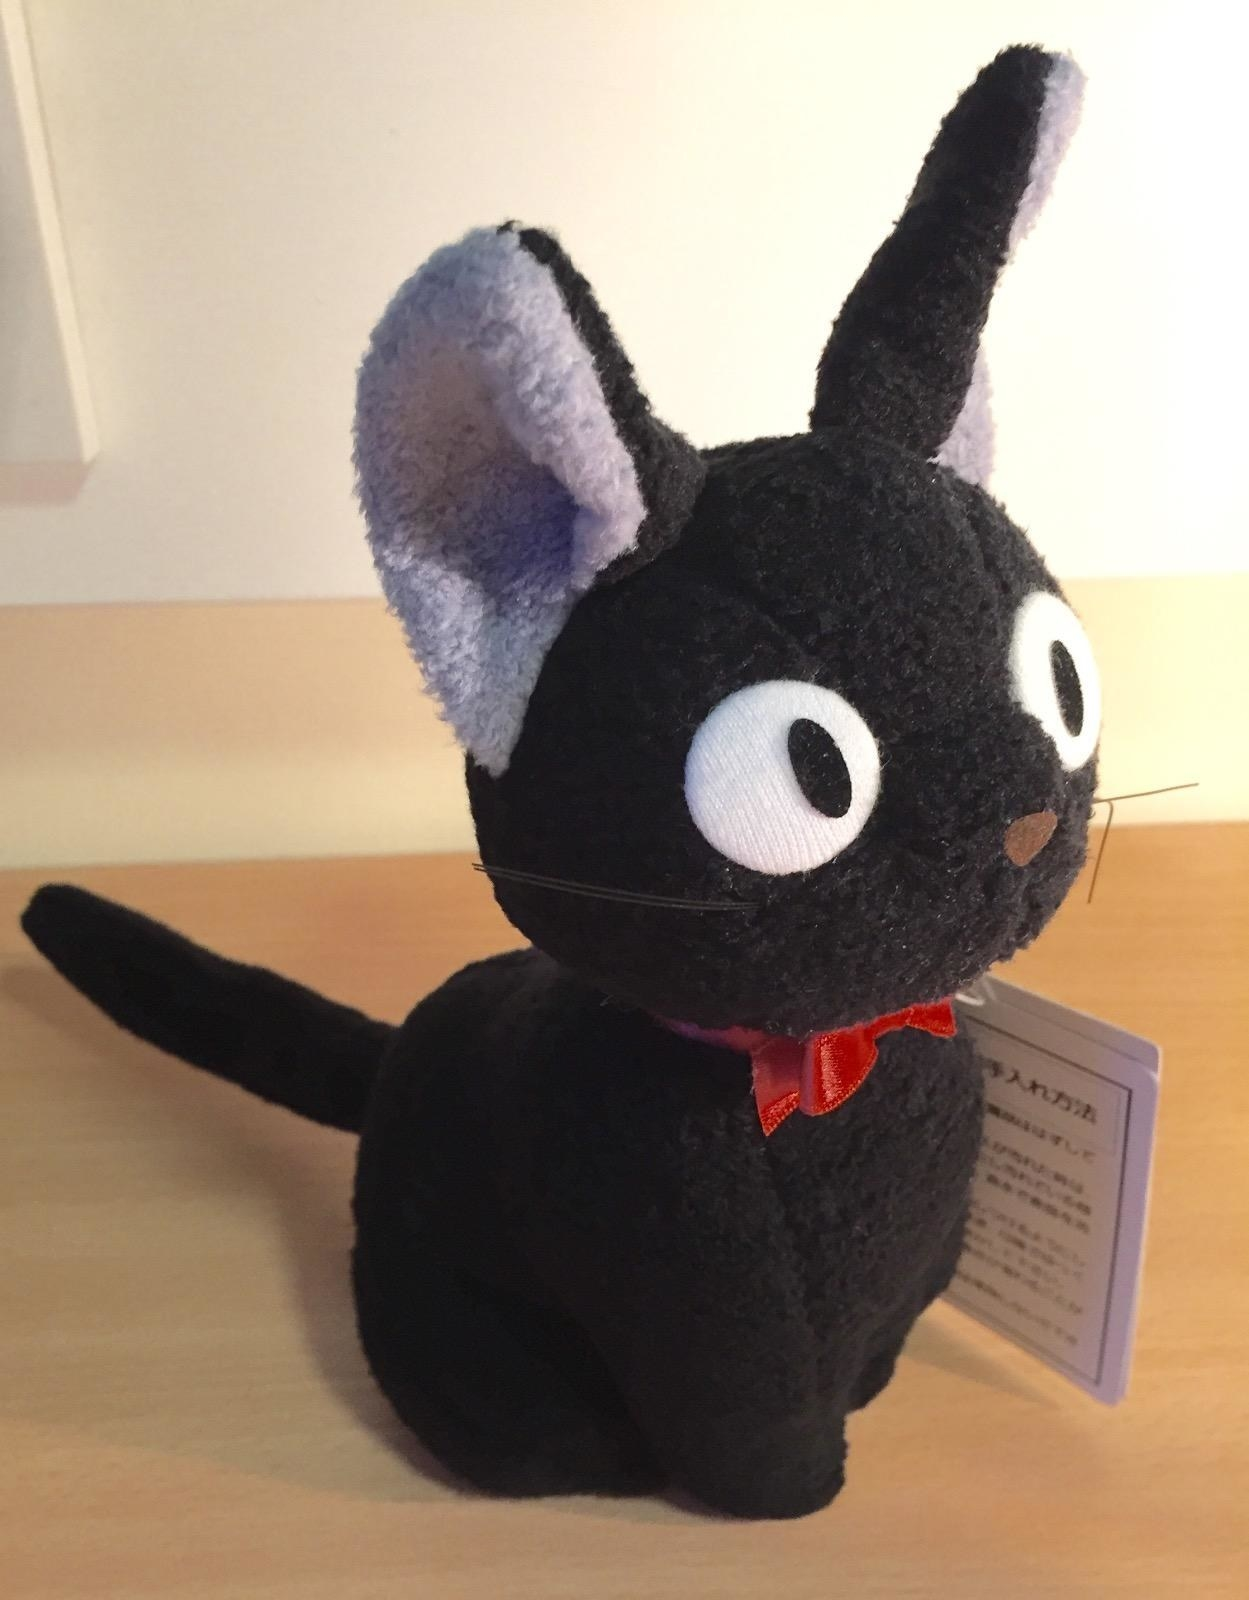 a black plush cat stuffed animal